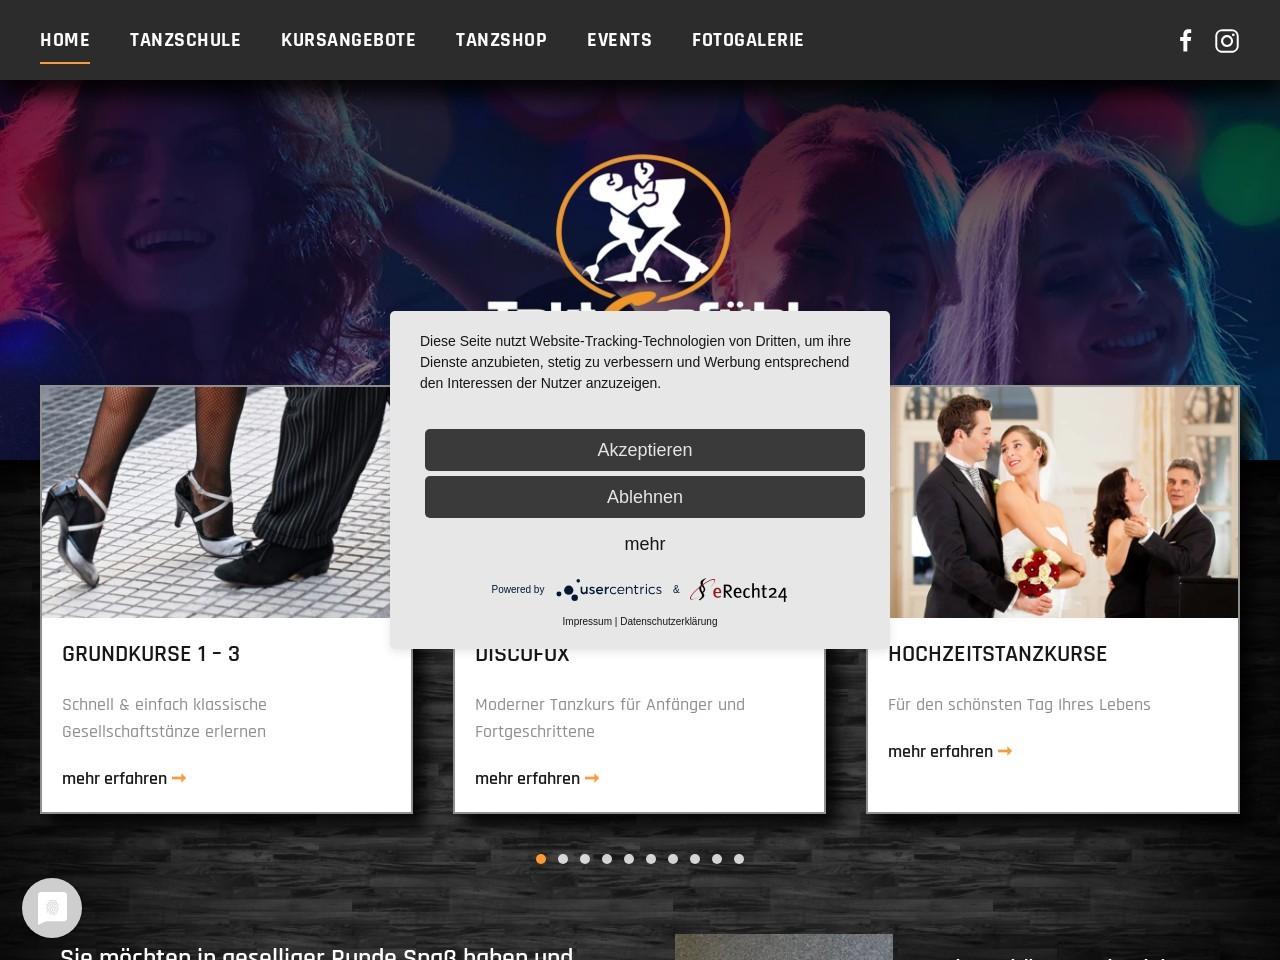 Tanzschule TaktGefühl